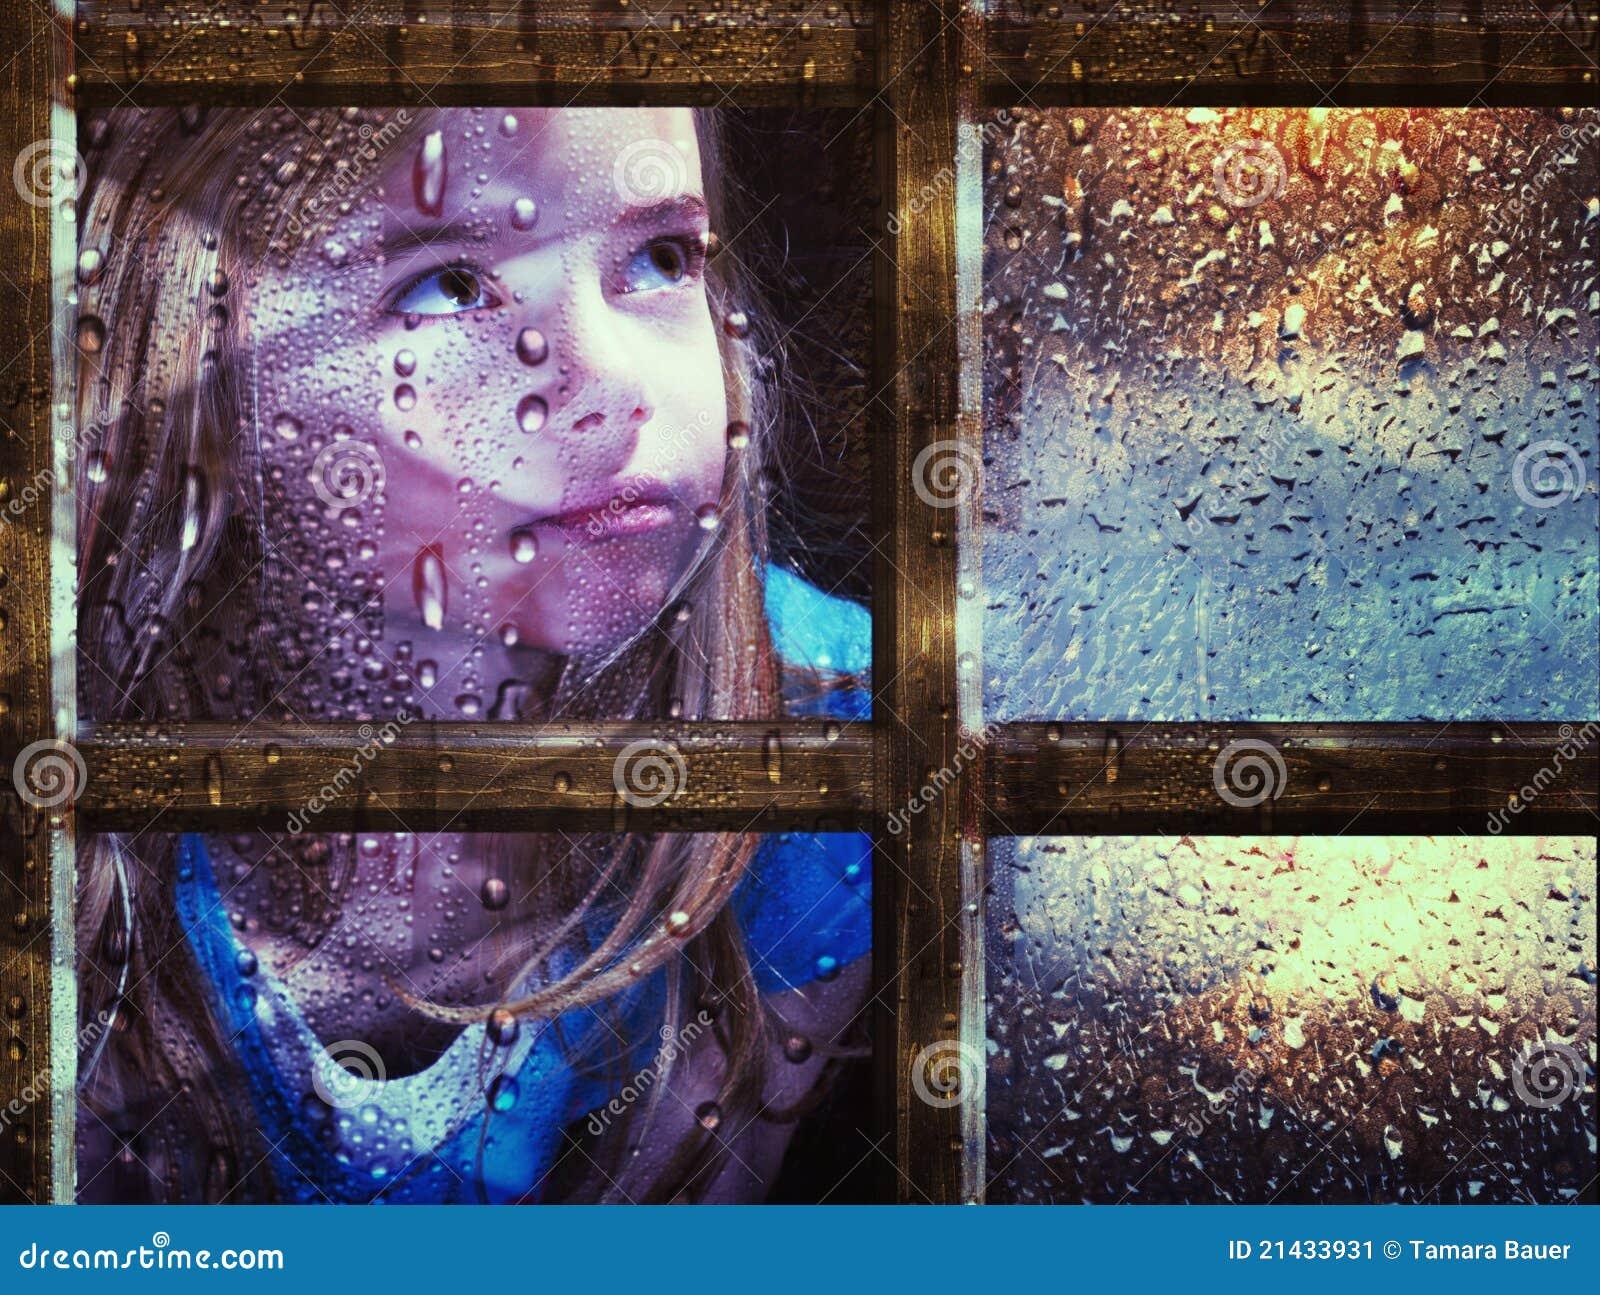 Muchacha en la ventana en lluvia